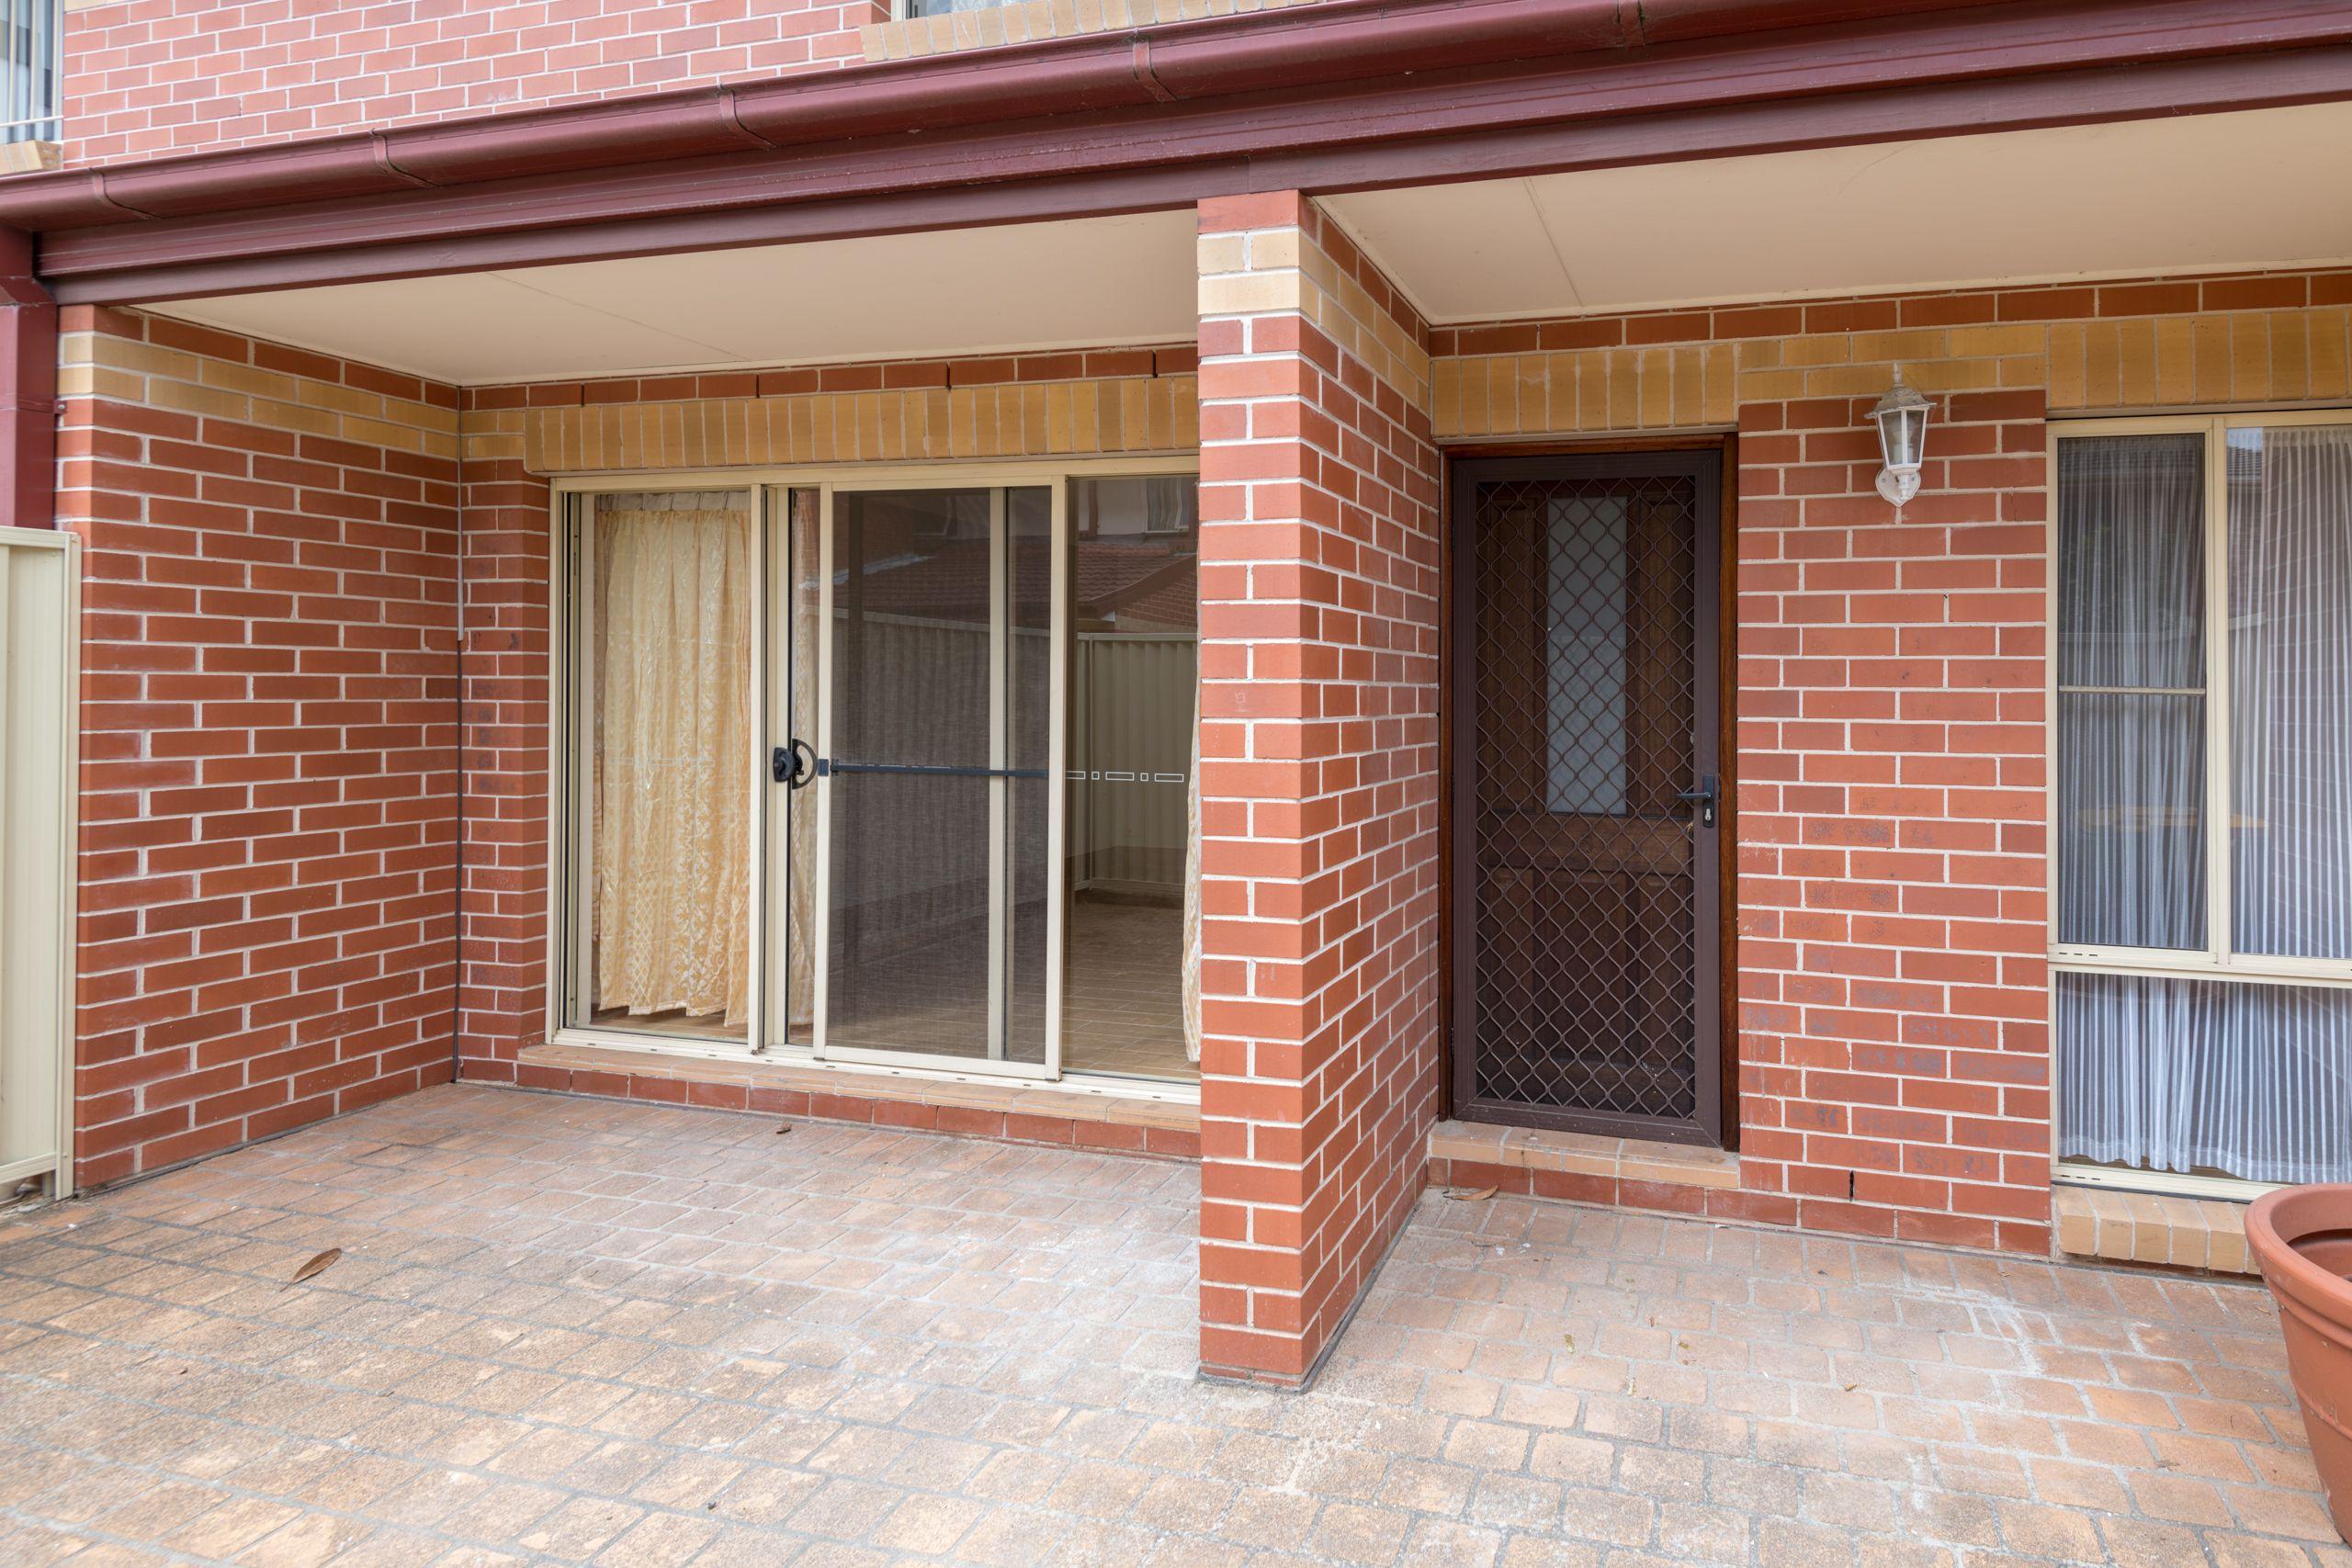 5/55 Manson Road, Strathfield NSW 2135